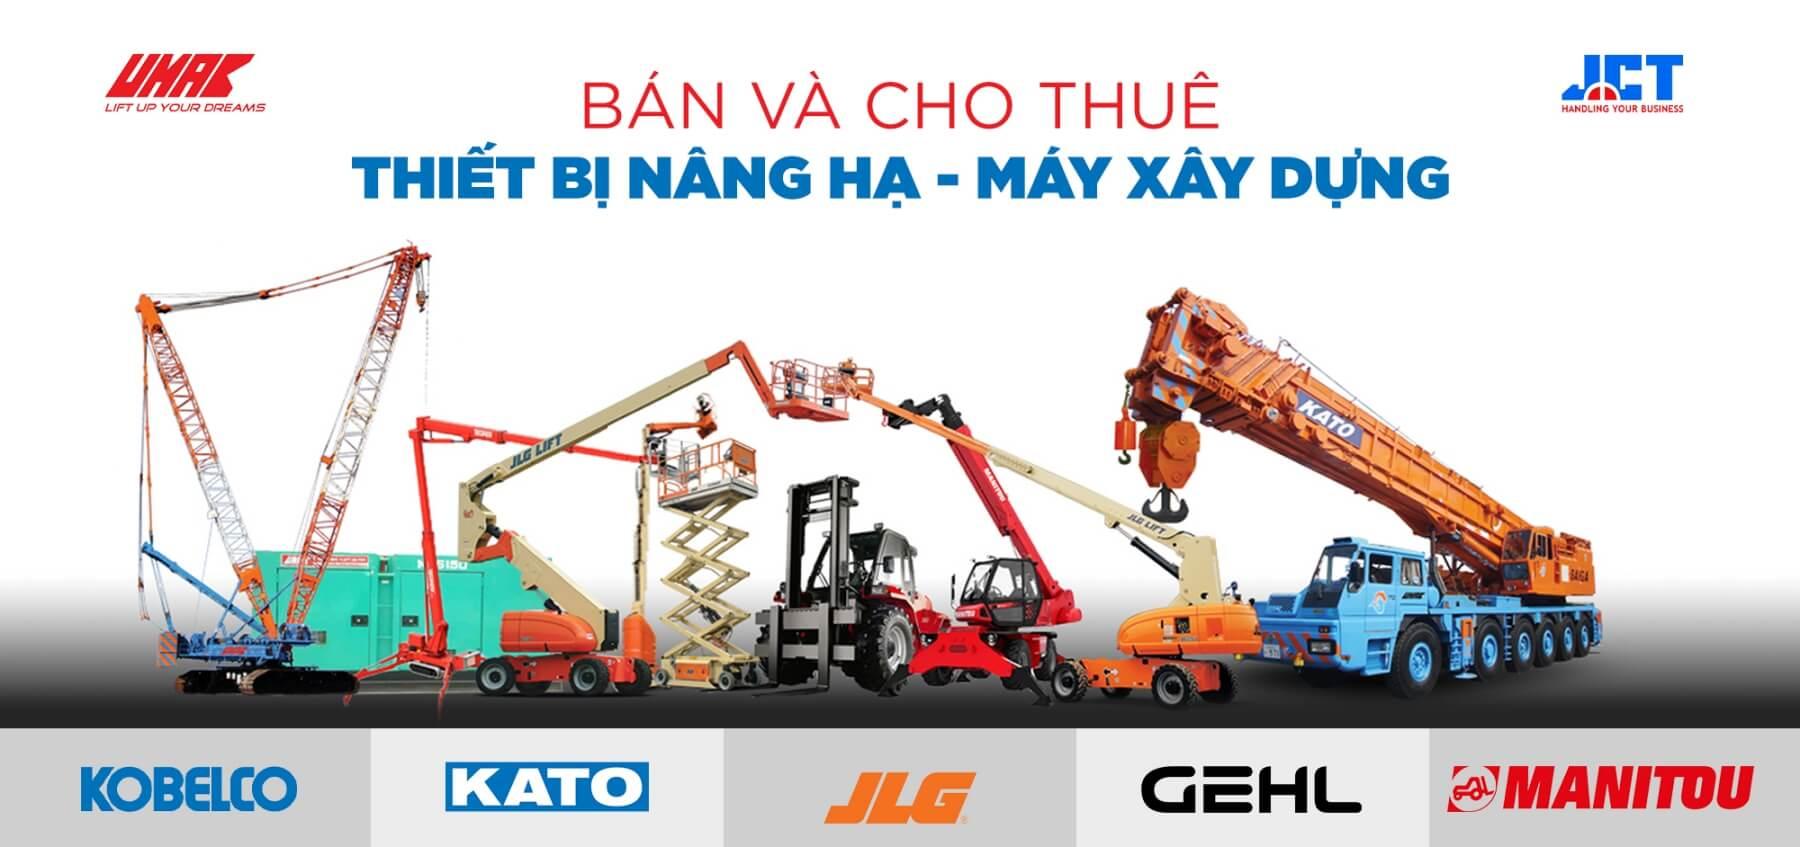 Tin tức U-Mac Việt Nam